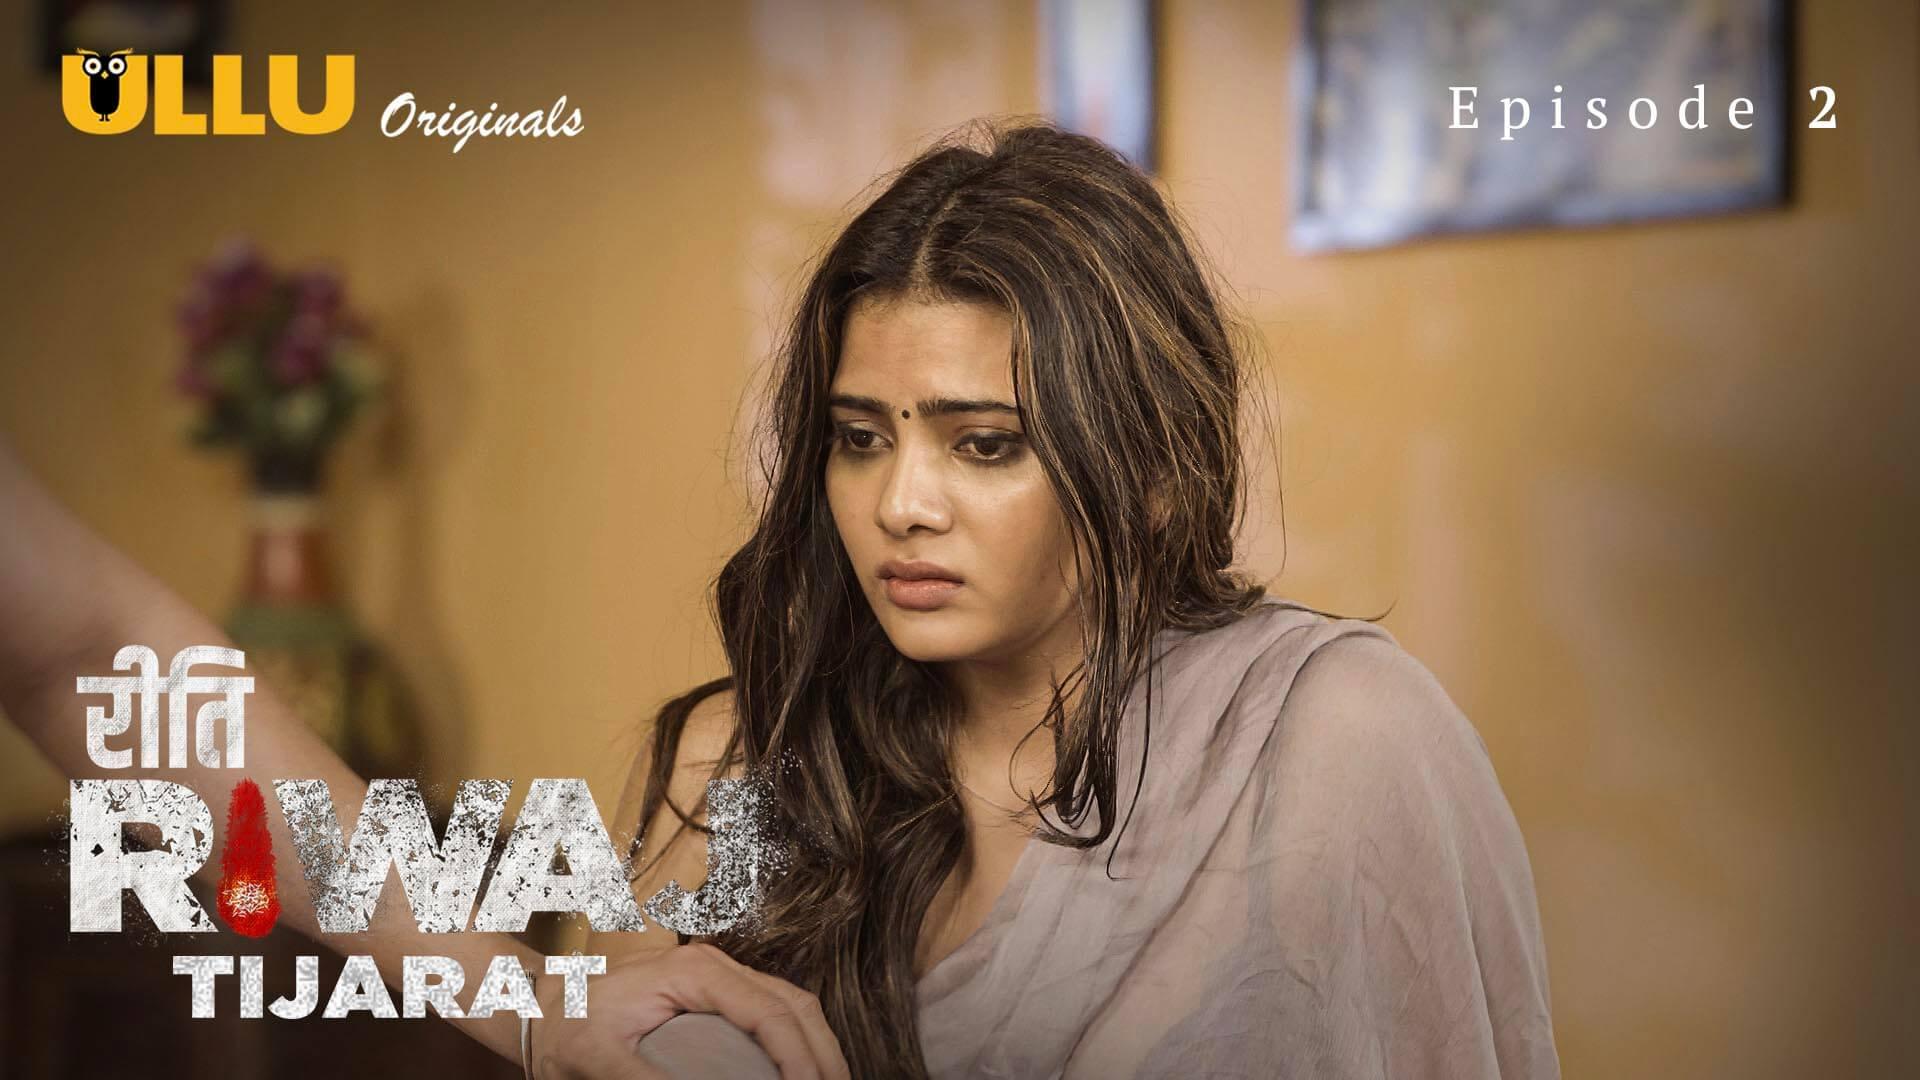 Riti Riwaz Tijarat web series (Episode 2)